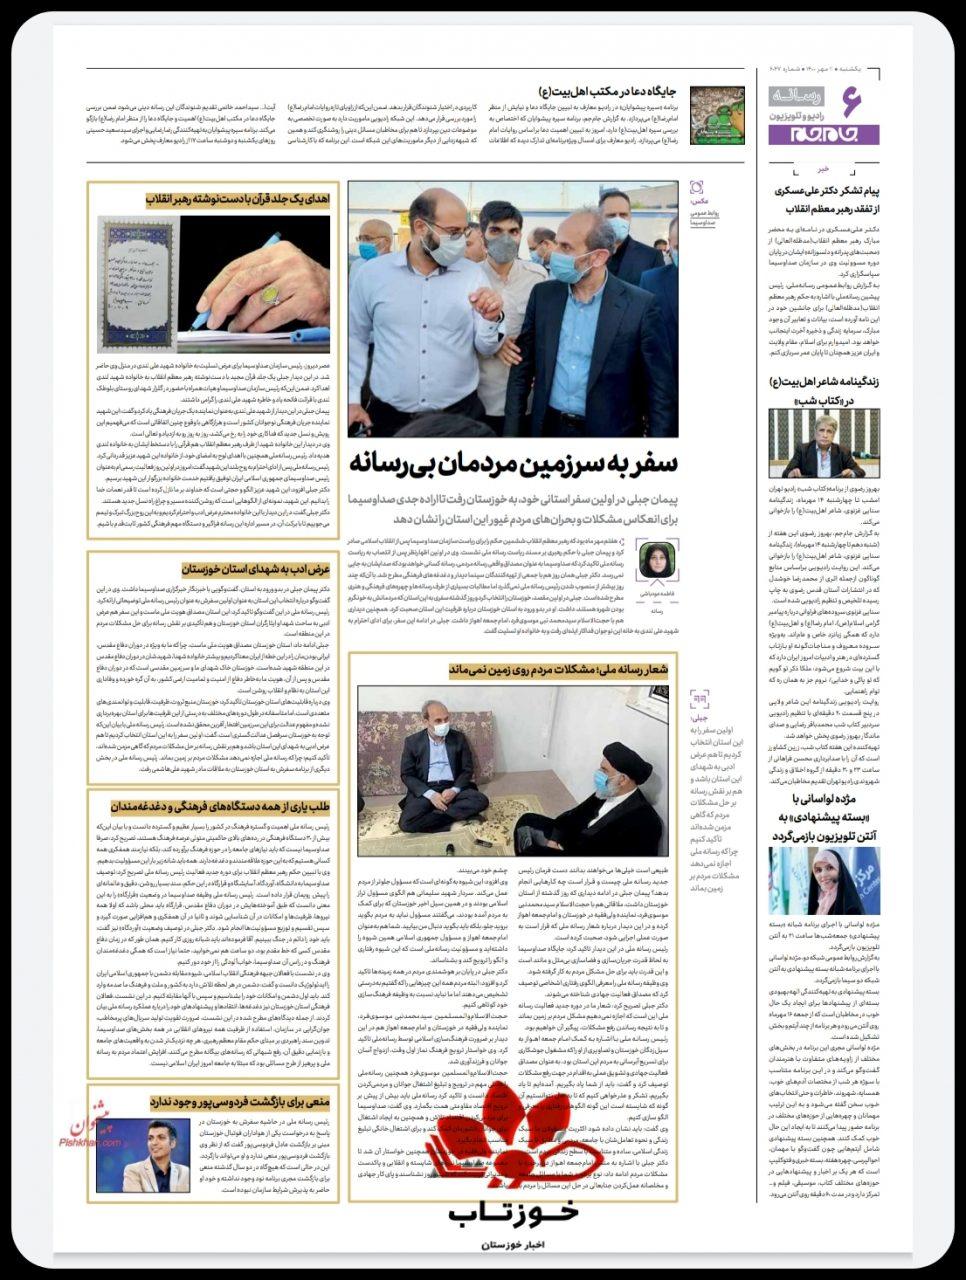 PicsArt 10 07 03.01.01 966x1280 بله خوزستان در رسانه ملی، بی رسانه است